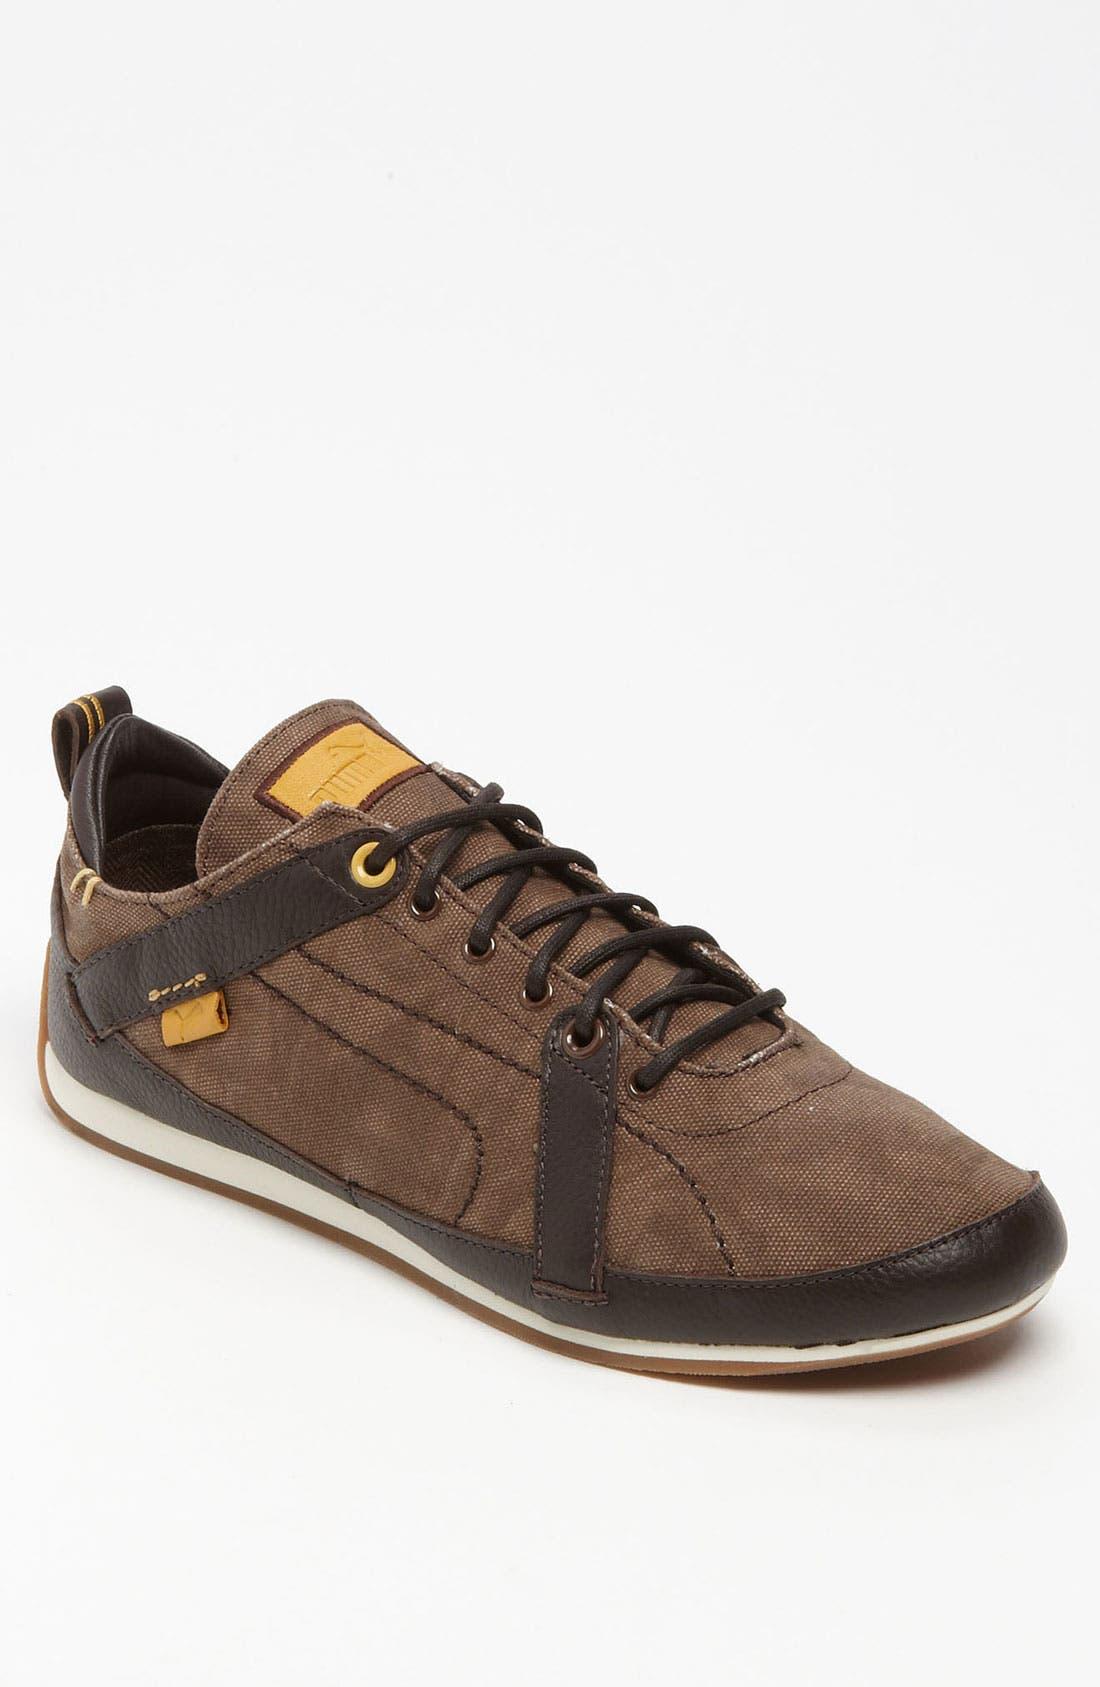 Main Image - PUMA 'Vettura Classico - Low' Sneaker (Men)